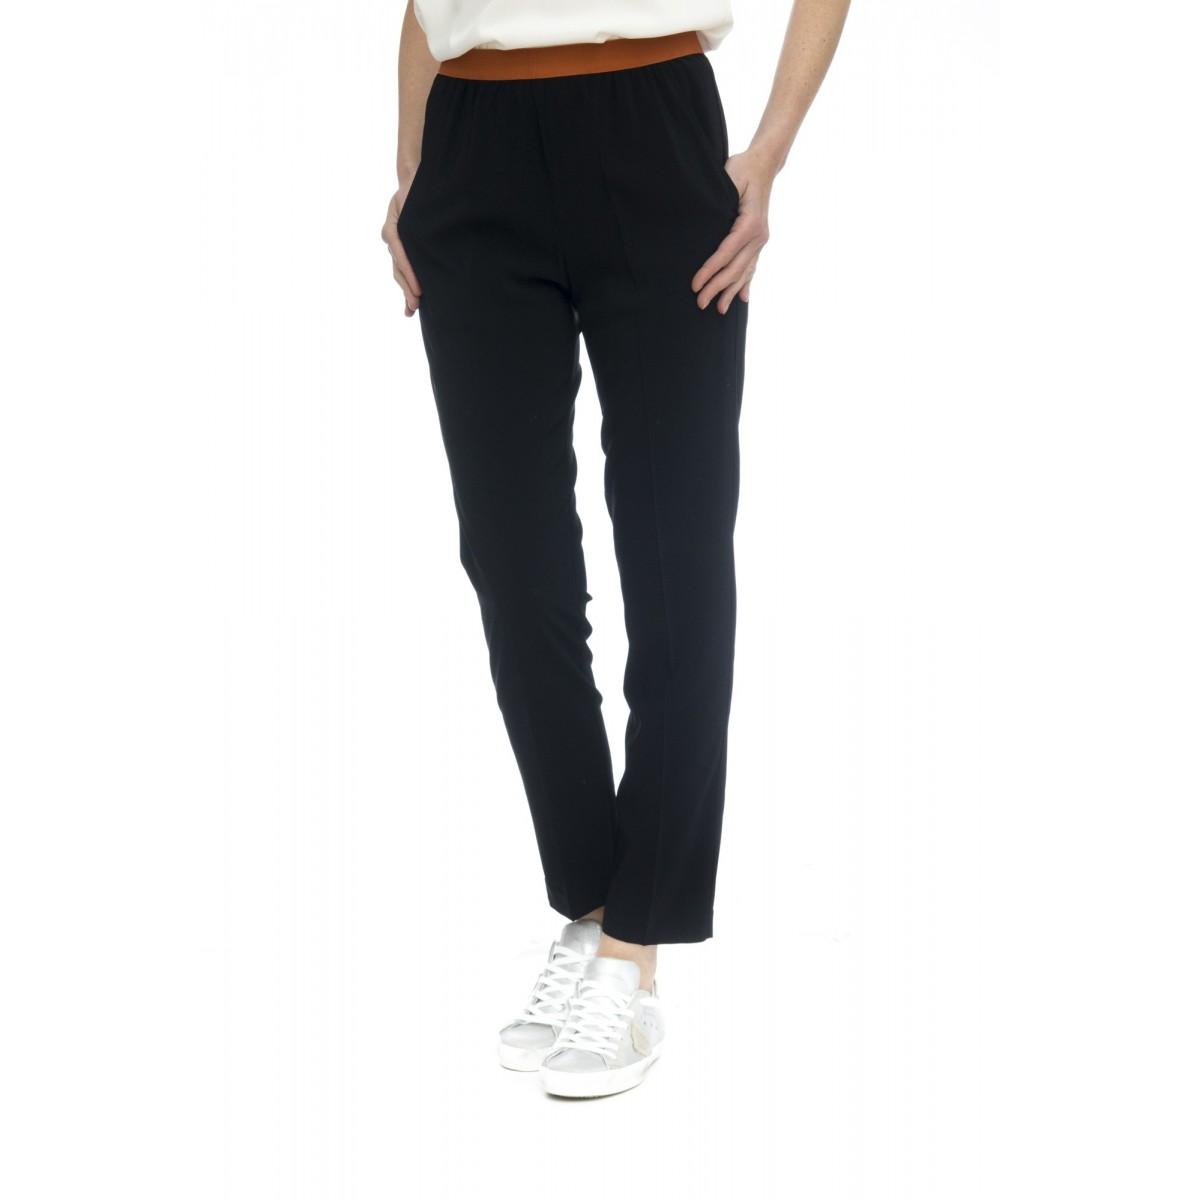 Pantalone donna - 4101 pantalone morbido